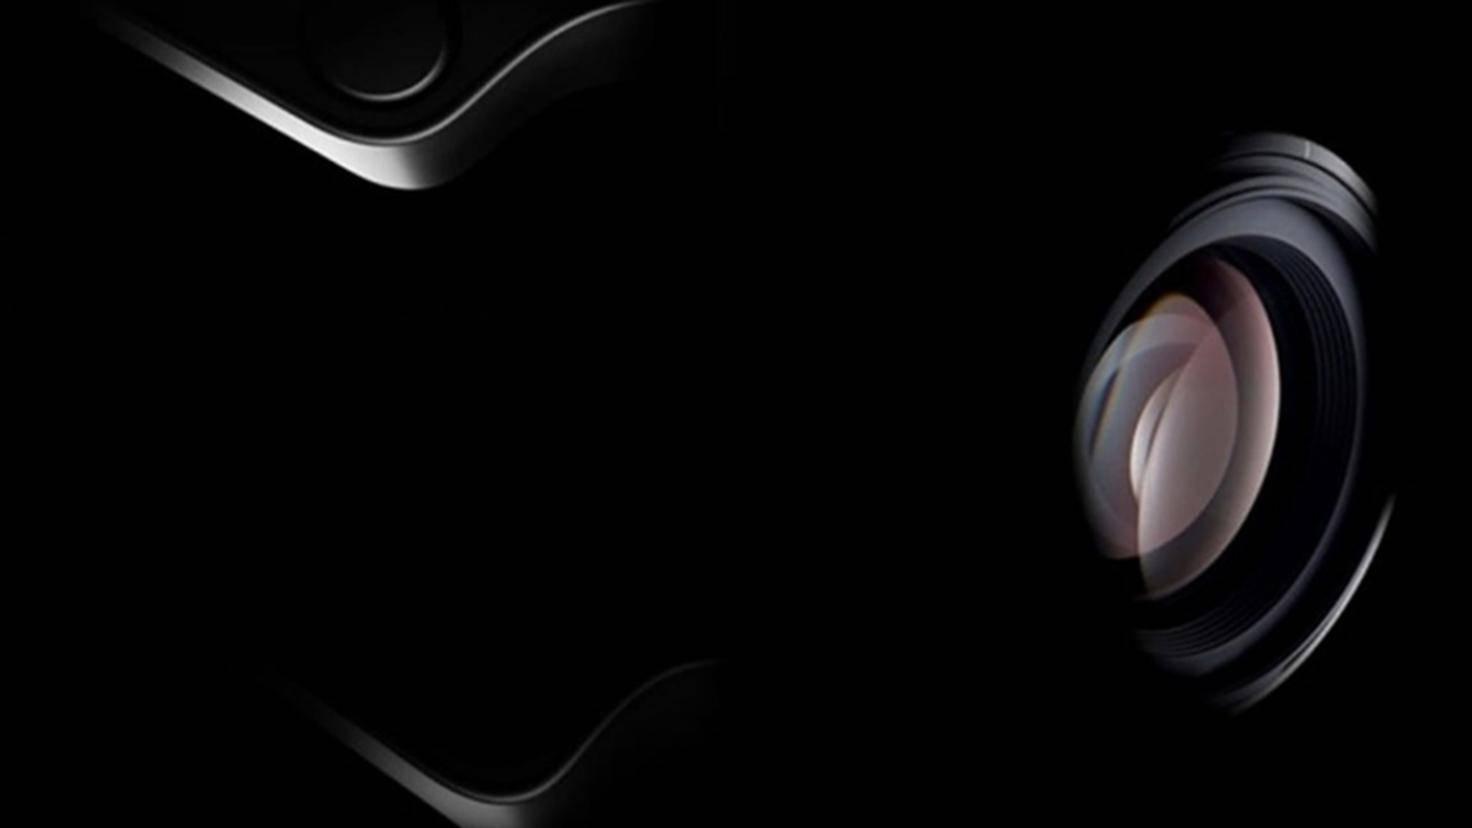 Zeiss-Kompaktkamera-Vollformat